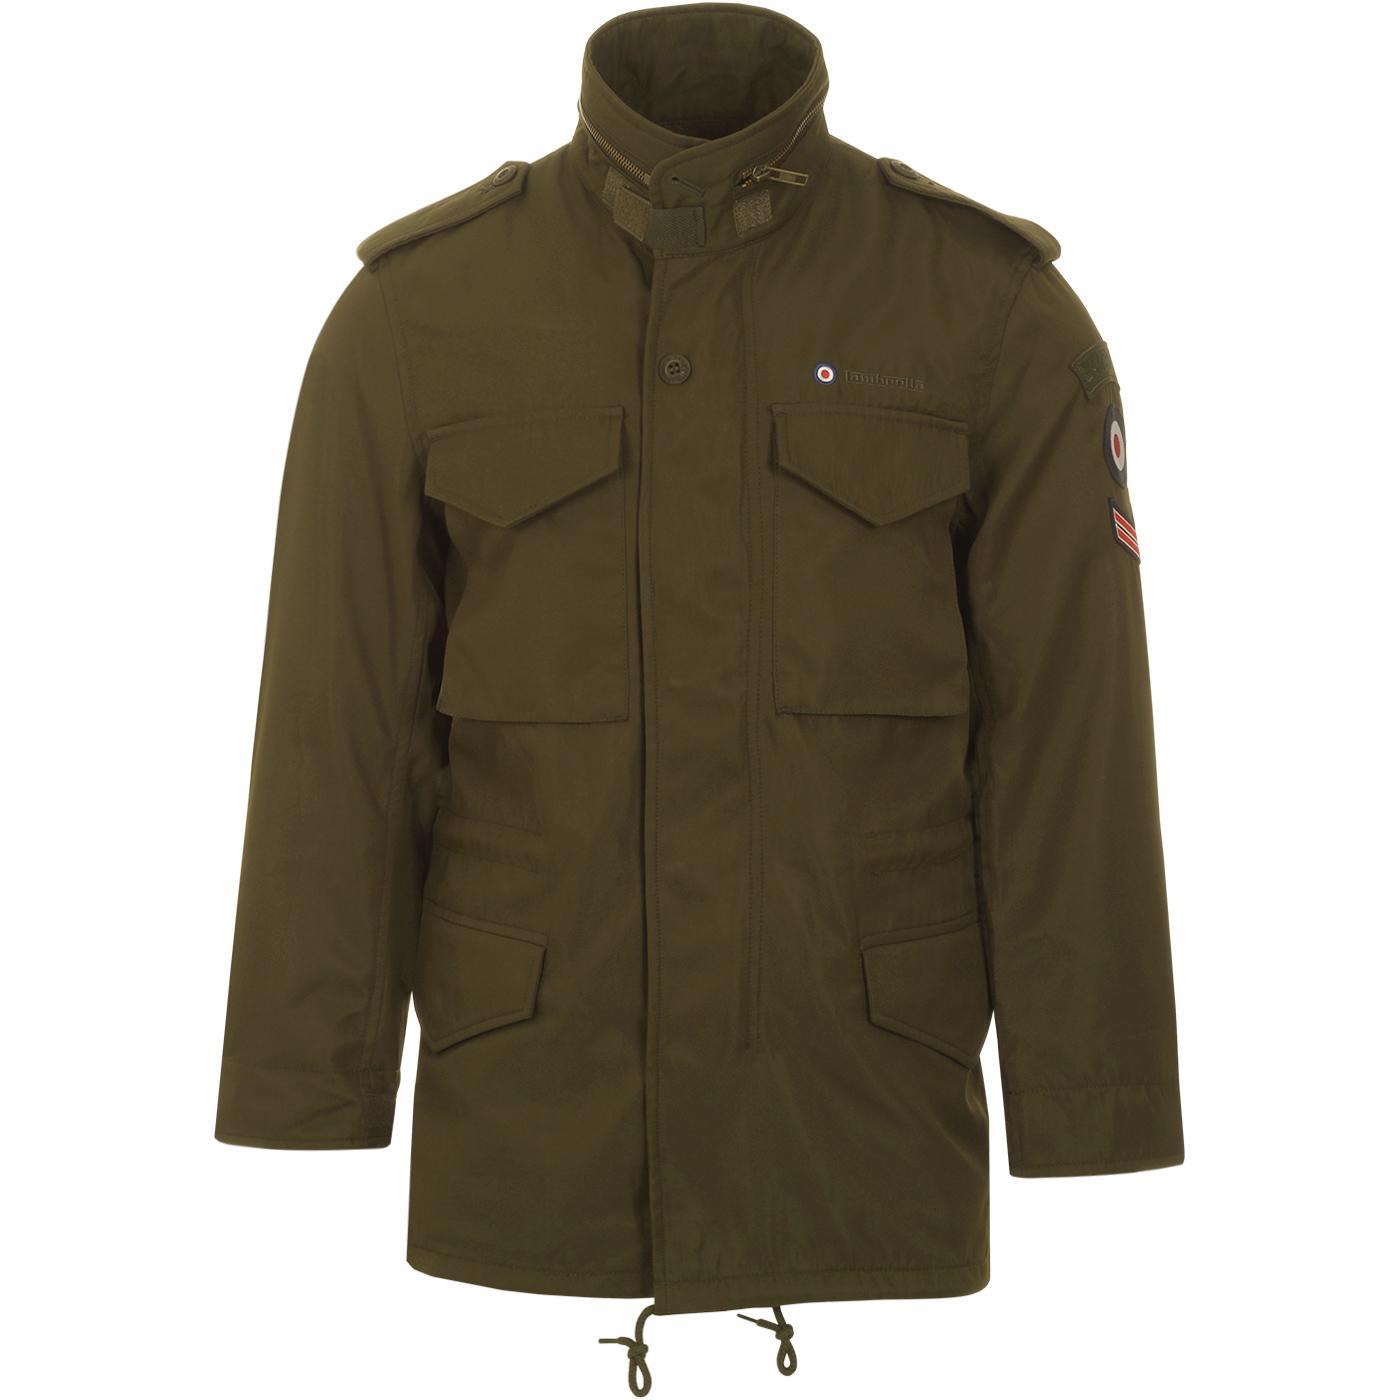 LAMBRETTA Men's Retro Mod Military Field Jacket